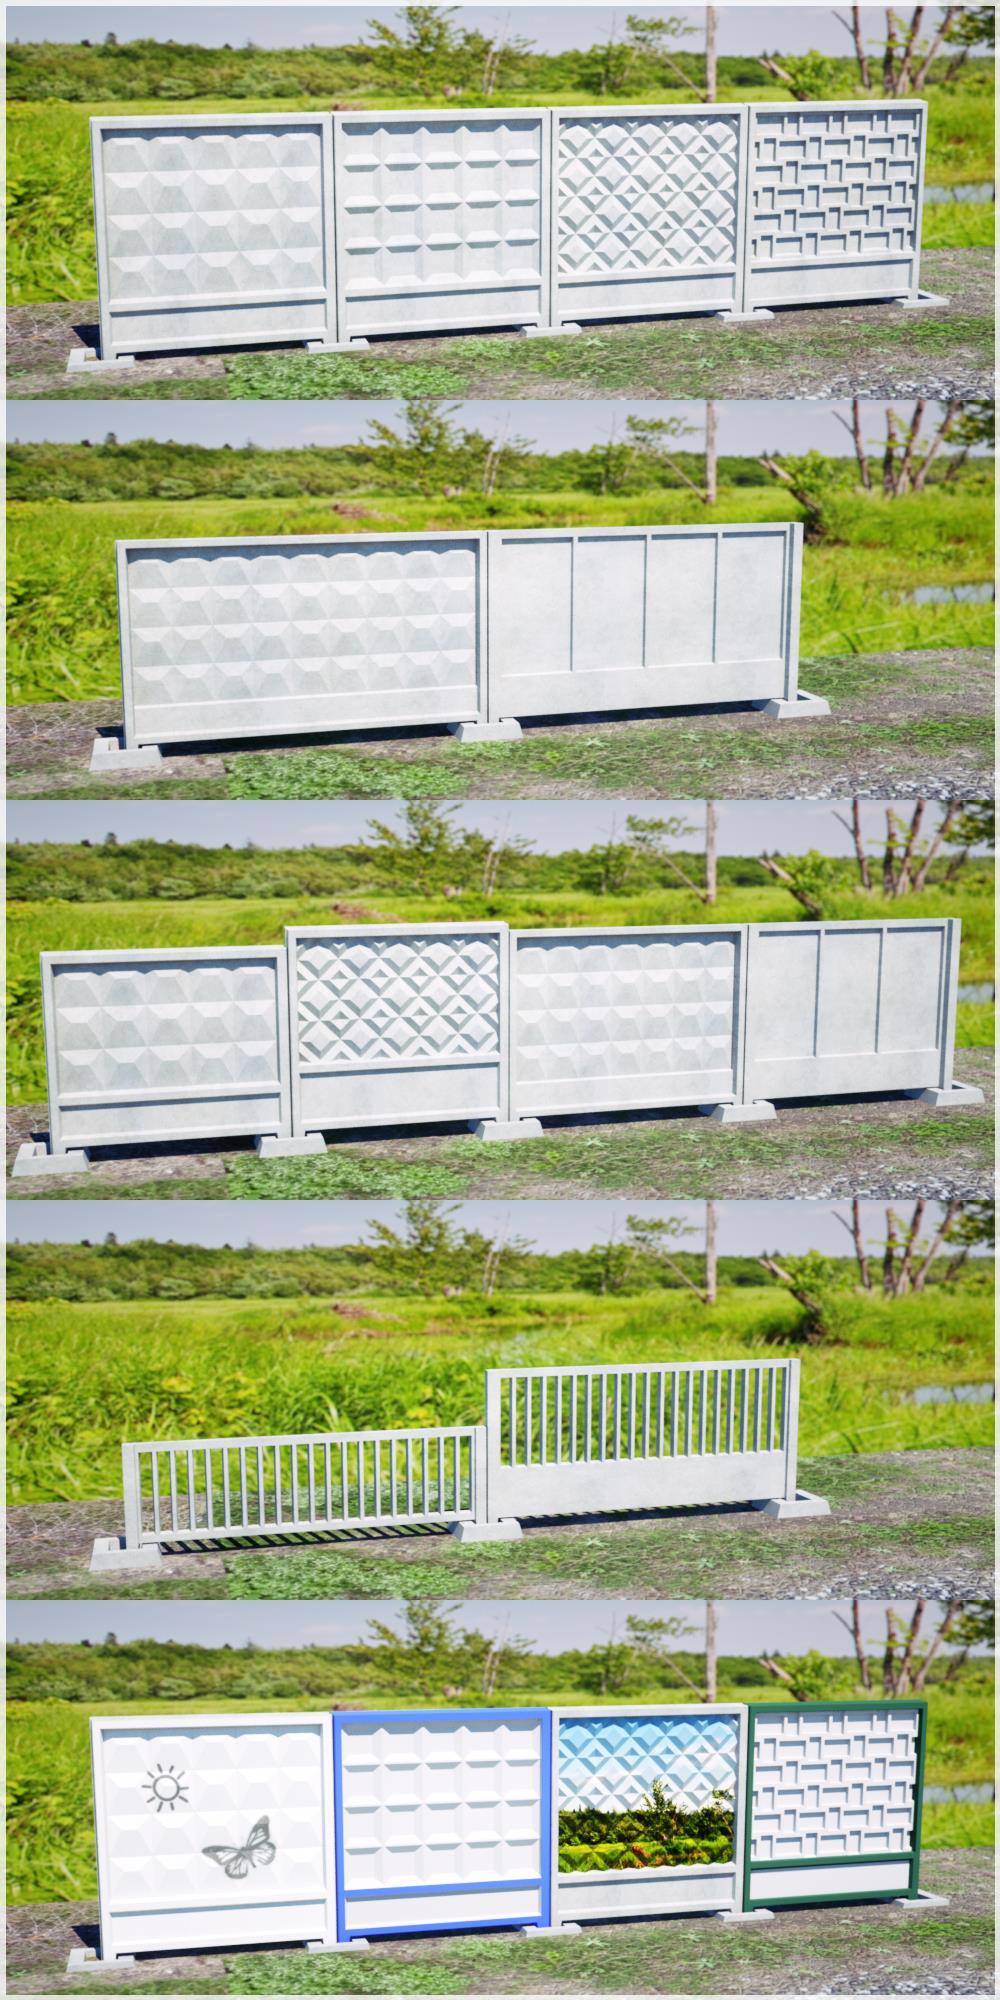 Modular concrete fence panels free 3d model obj by pnn32 on deviantart - Concrete fence models design ...